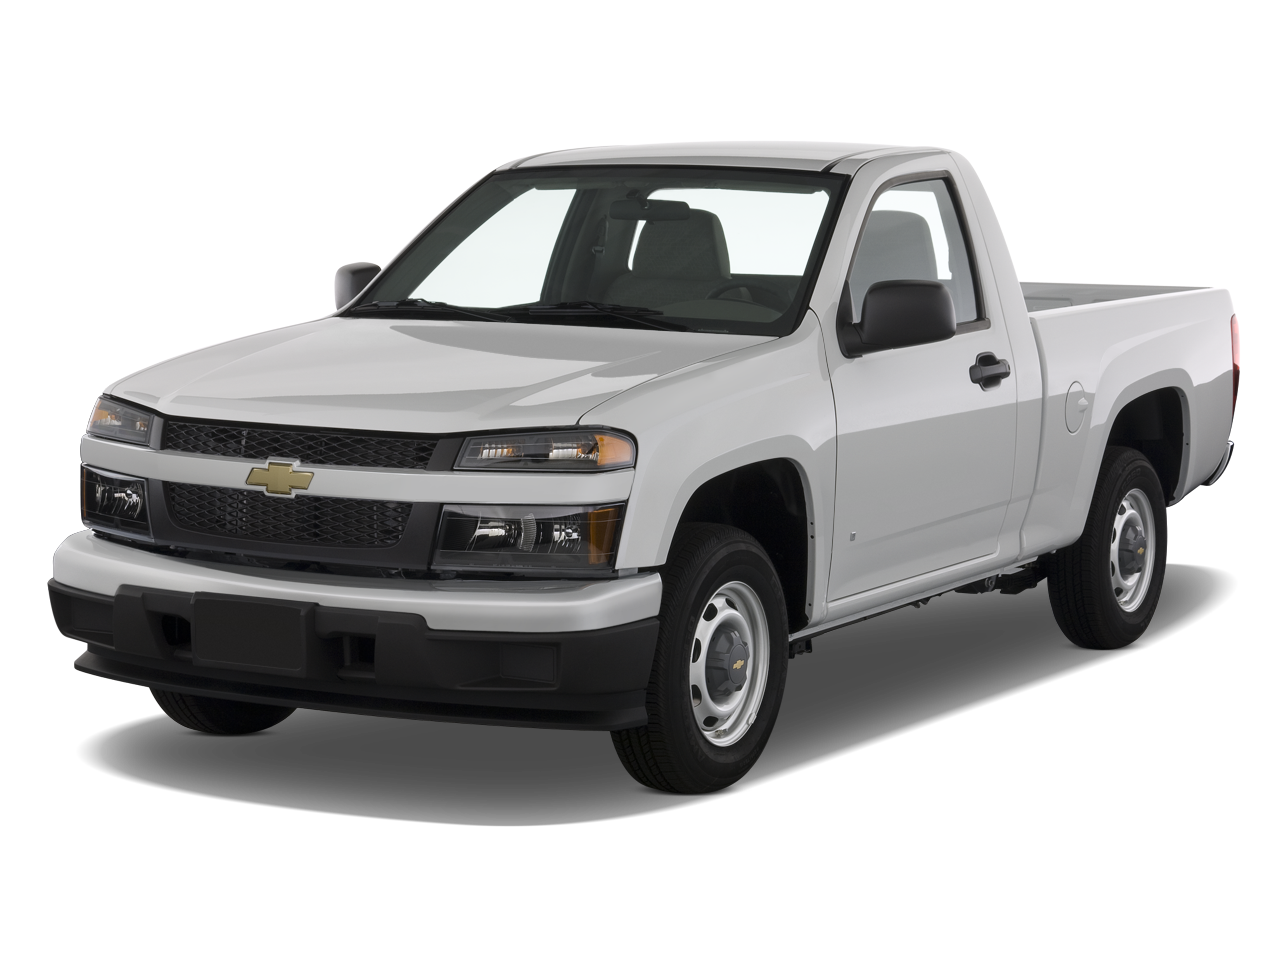 2009 chevrolet colorado 4wd crew cab 1lt chevy fullsize pickup truck review automobile magazine. Black Bedroom Furniture Sets. Home Design Ideas